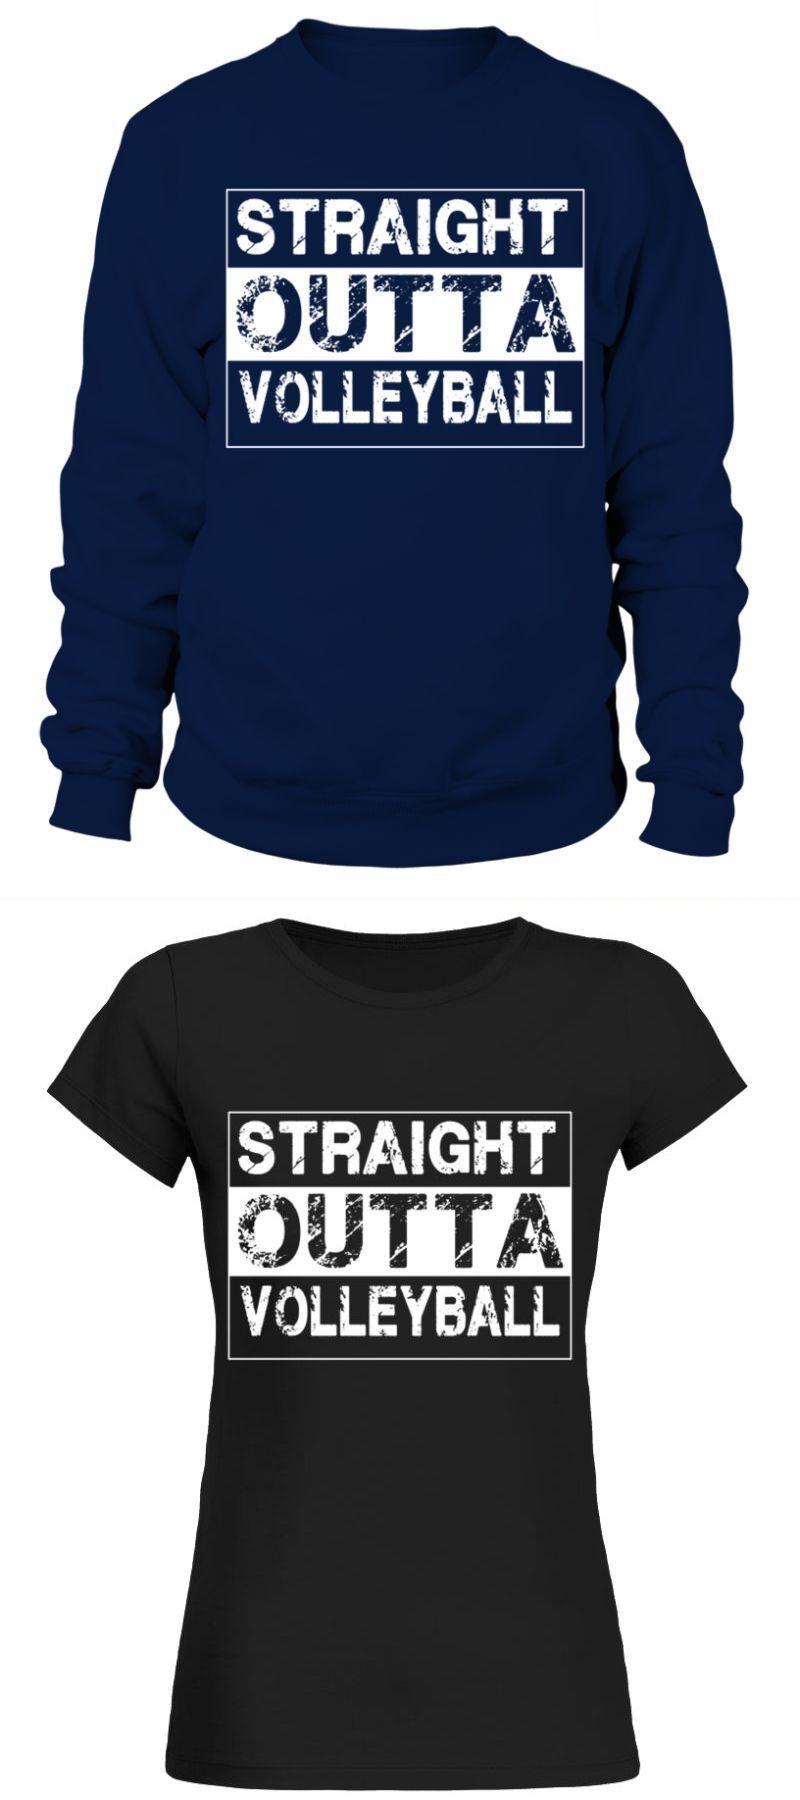 Volleyball T Shirt Design Templates Straight Outta Volleyball Sport